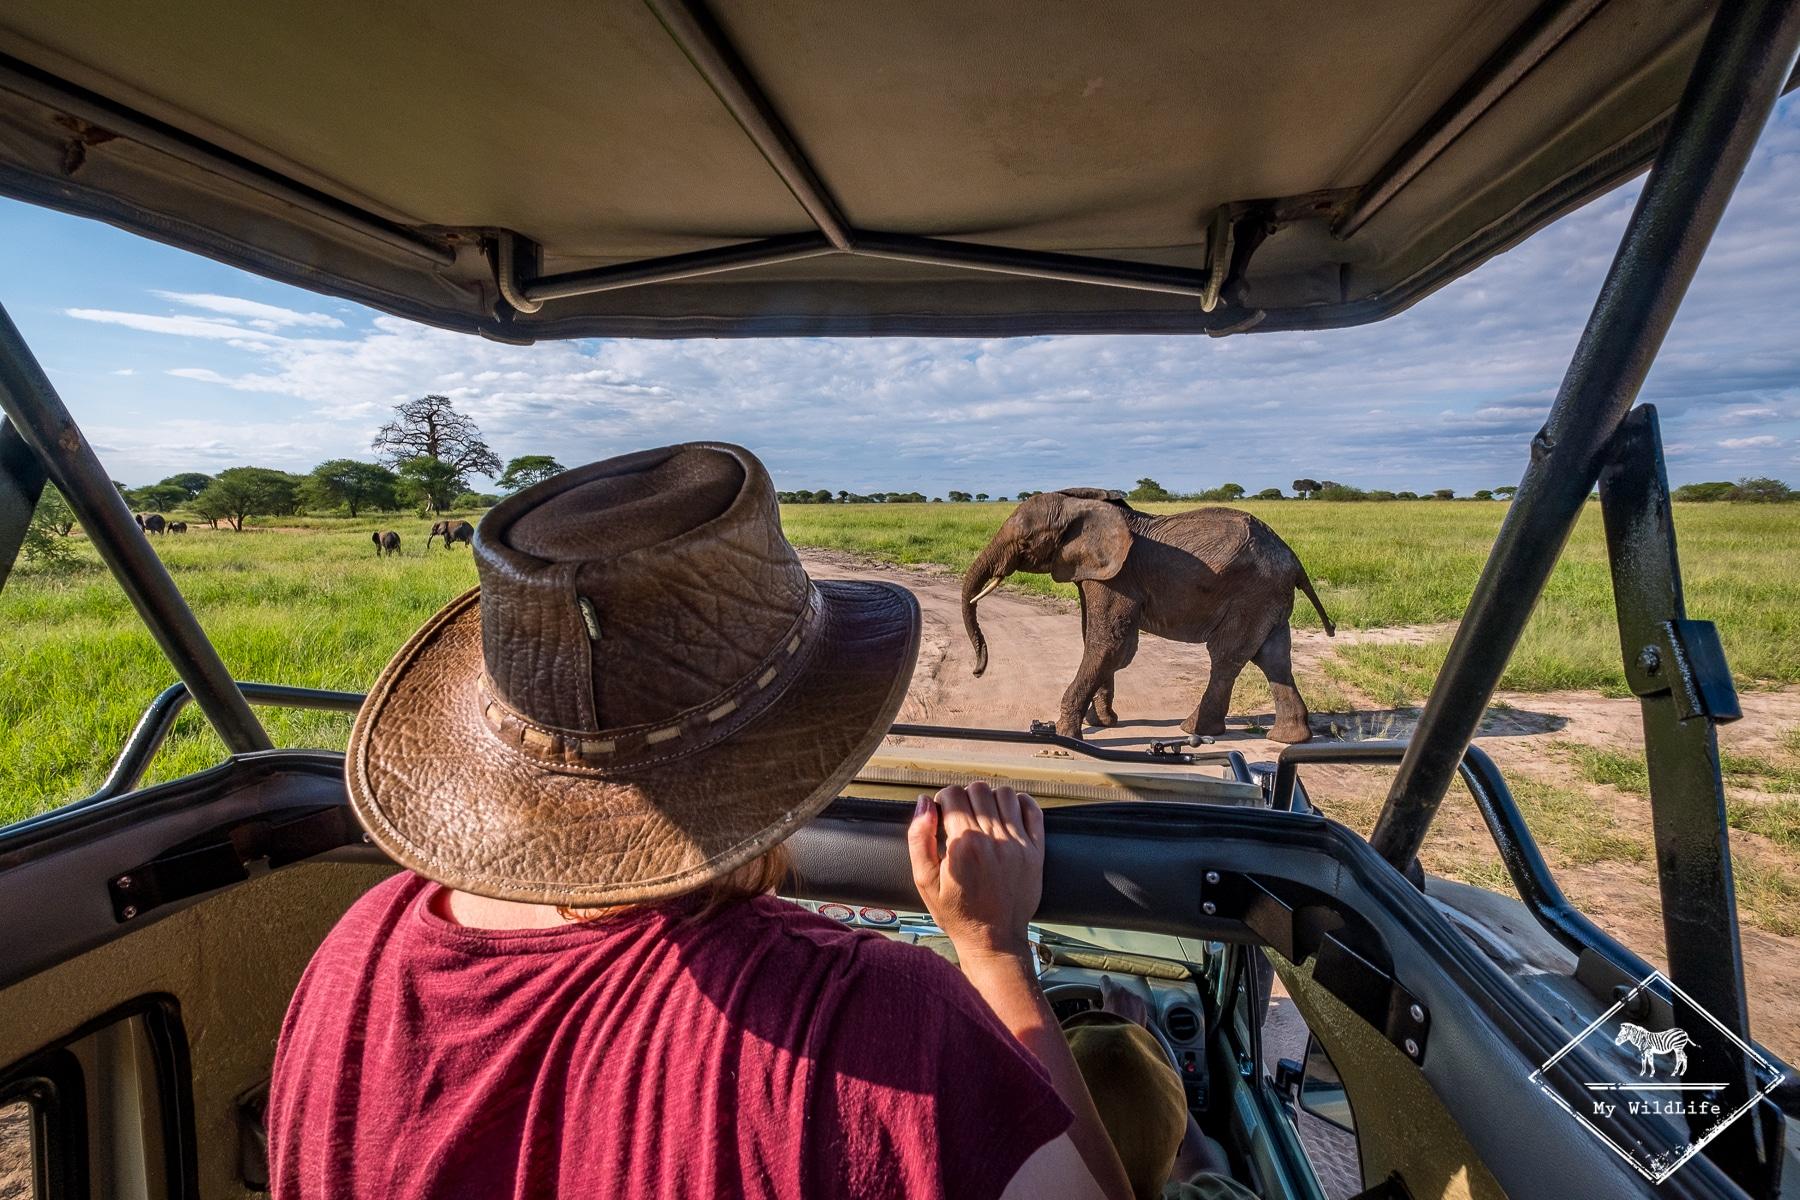 Eléphant, parc national de Tarangire